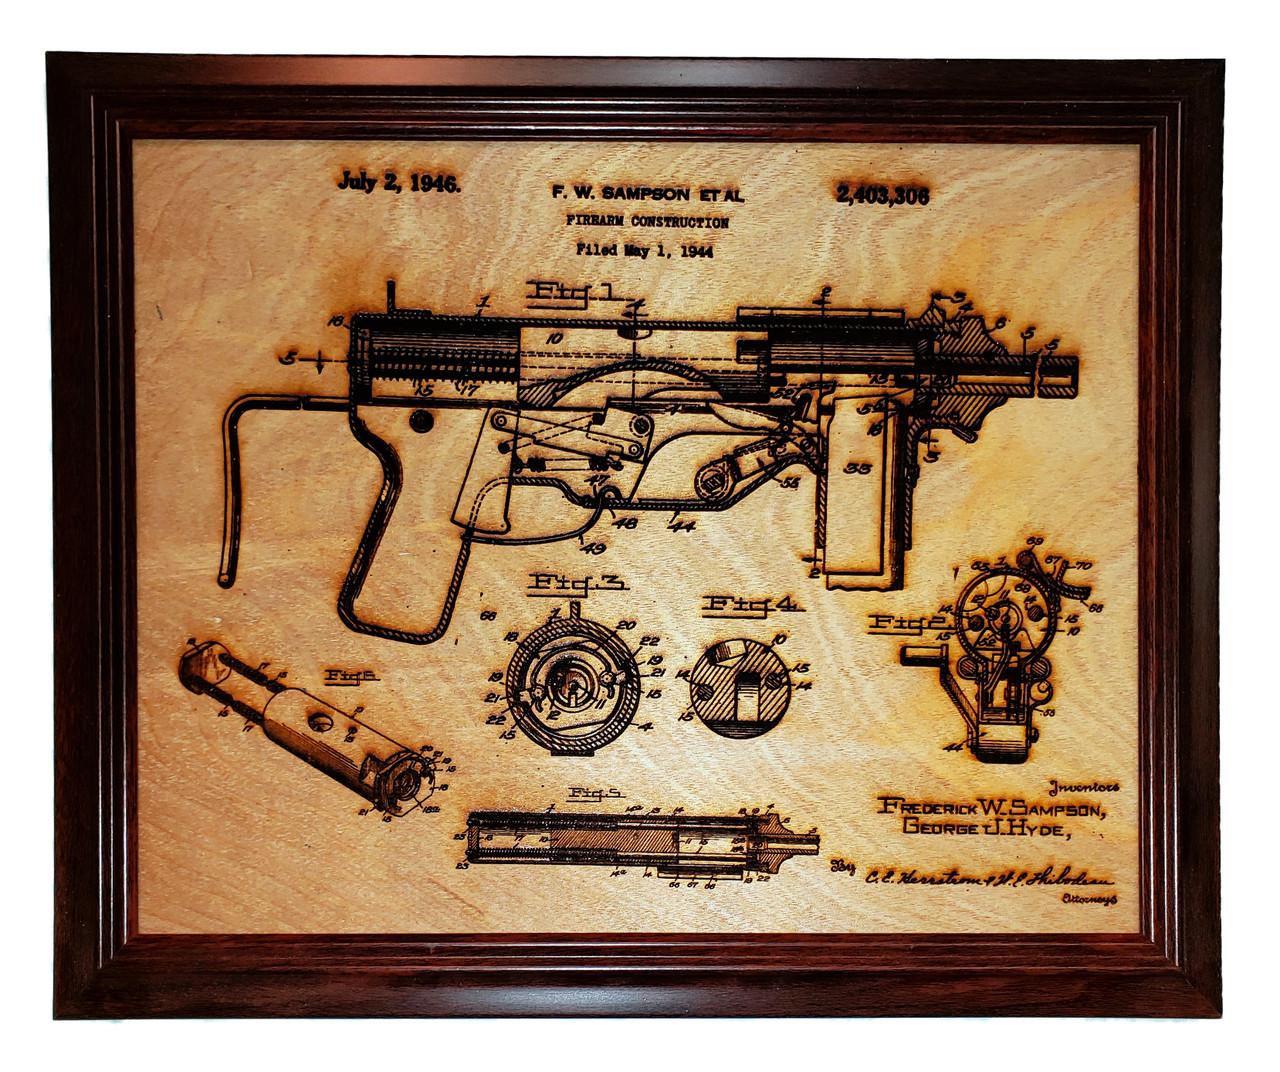 Framed laser art of the M-3 patent #2,403,306